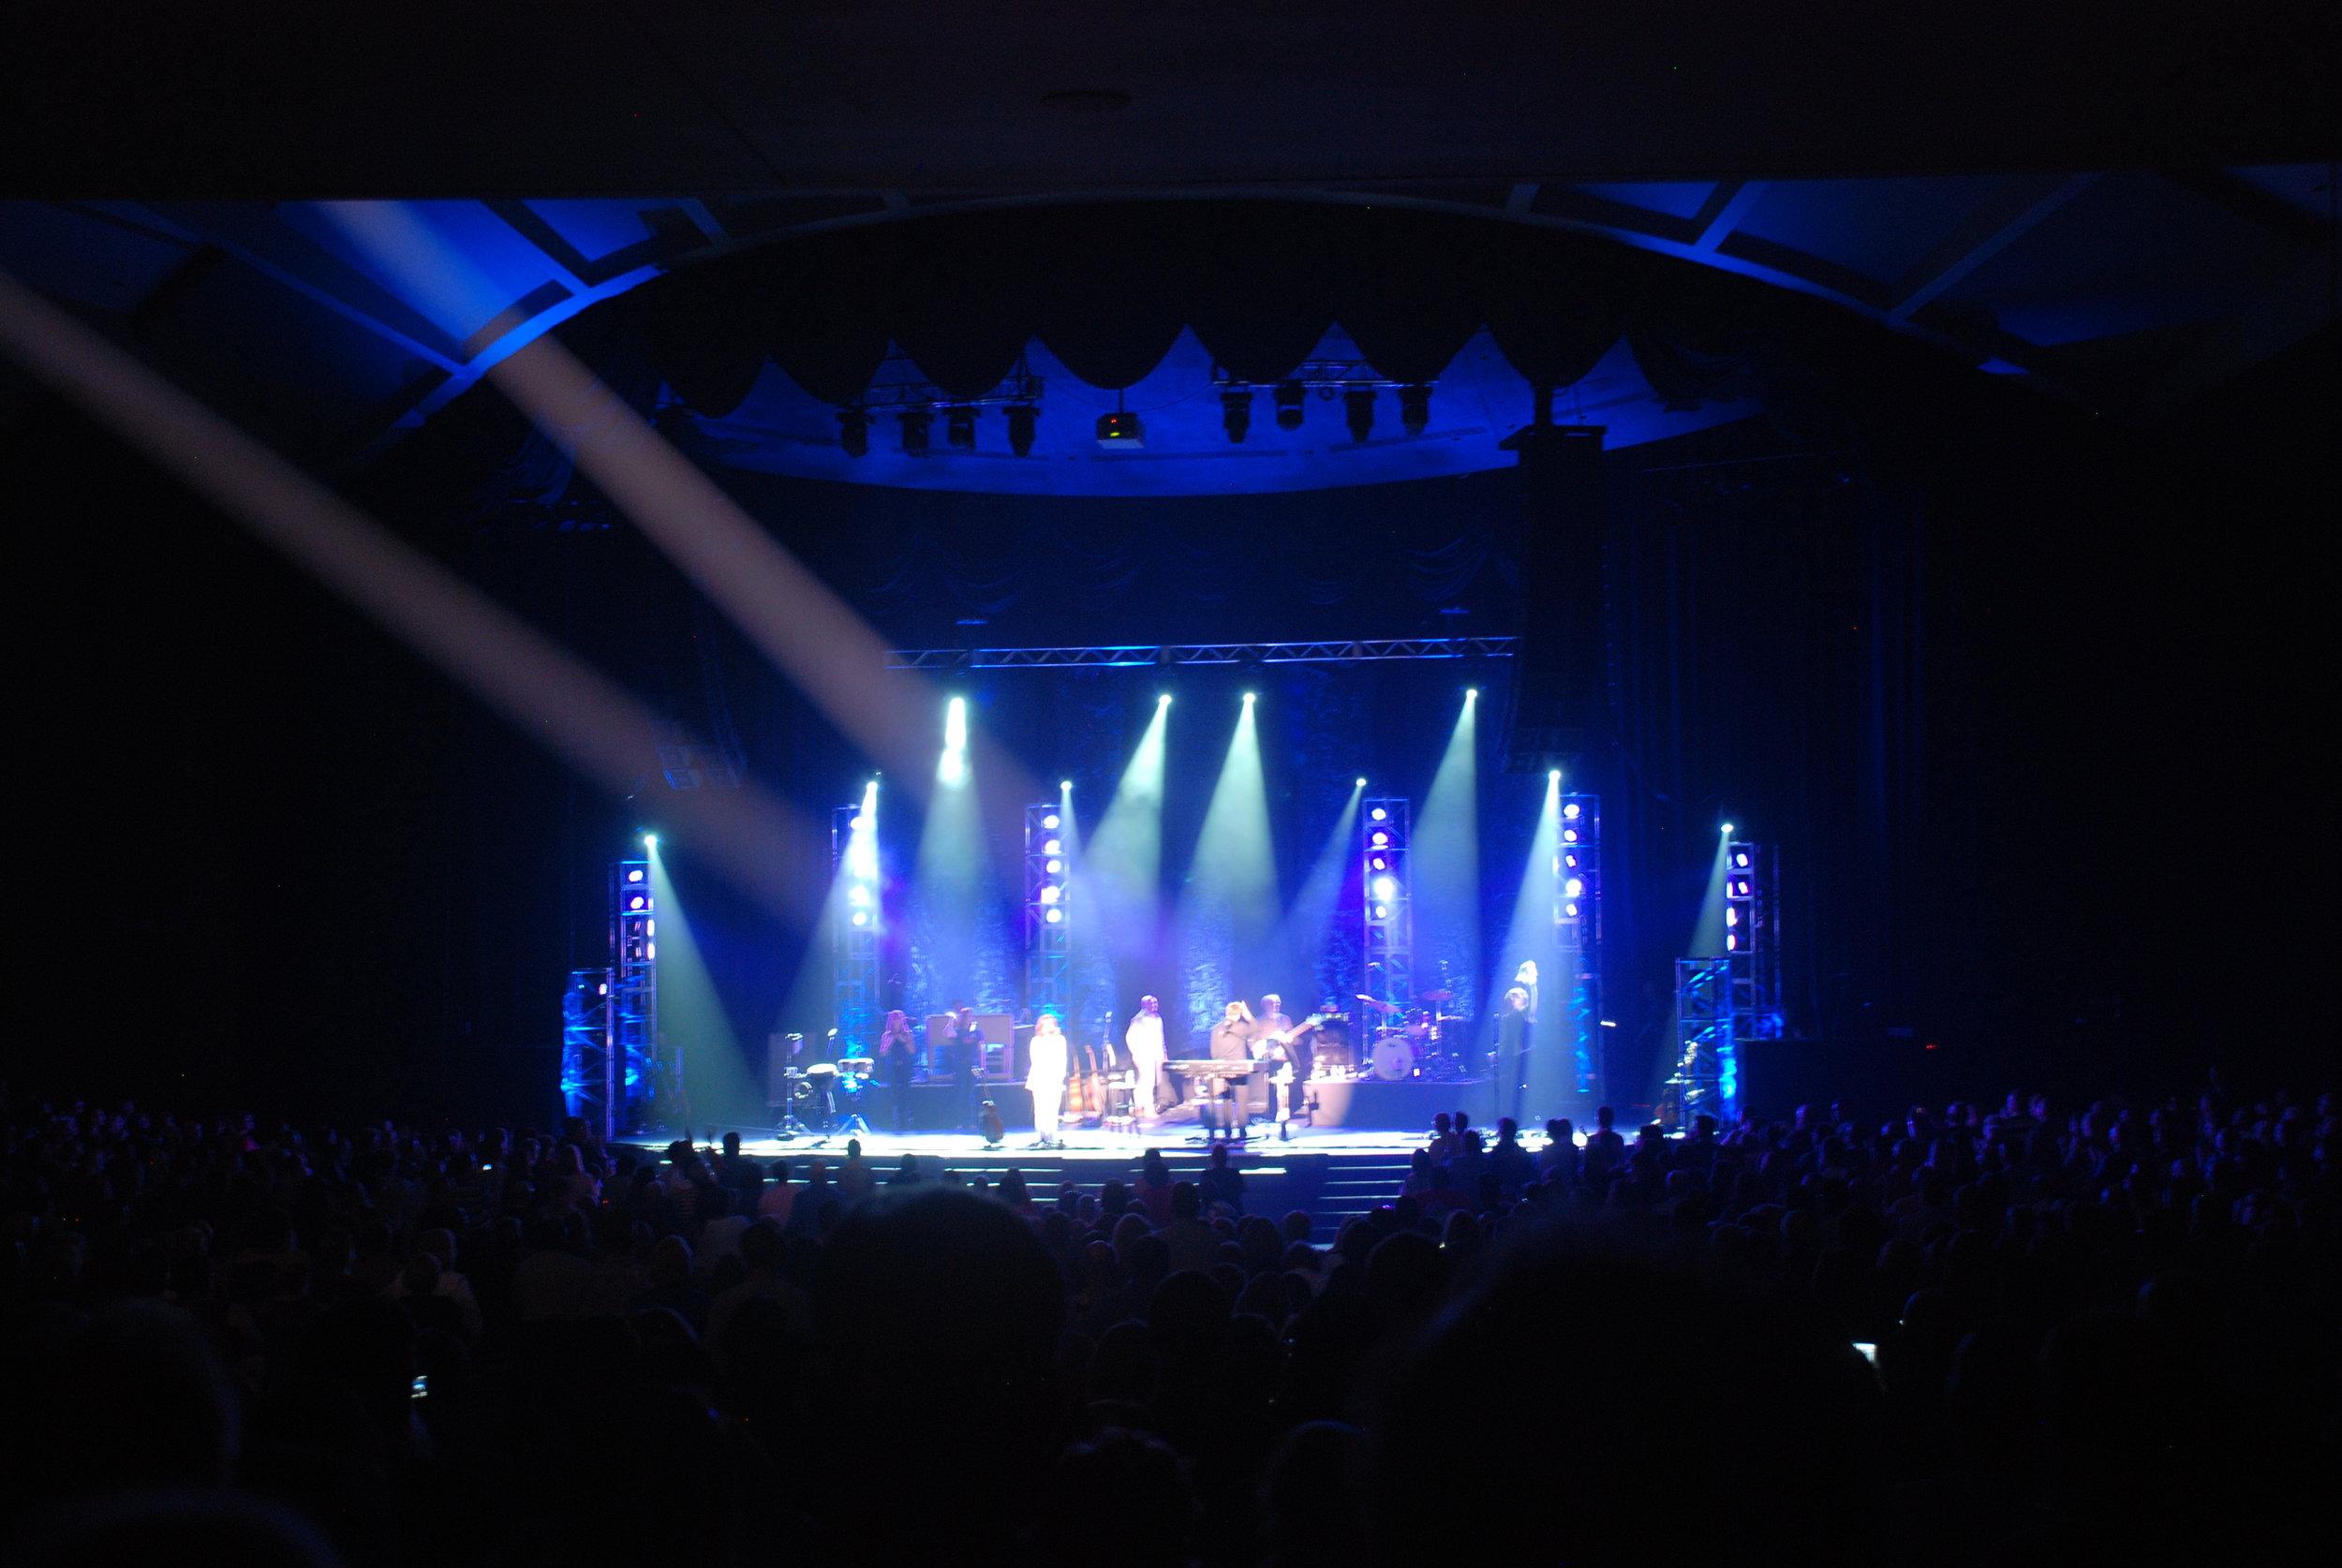 2 Friends Tour 2011  Amy Grant & Michael W. Smith